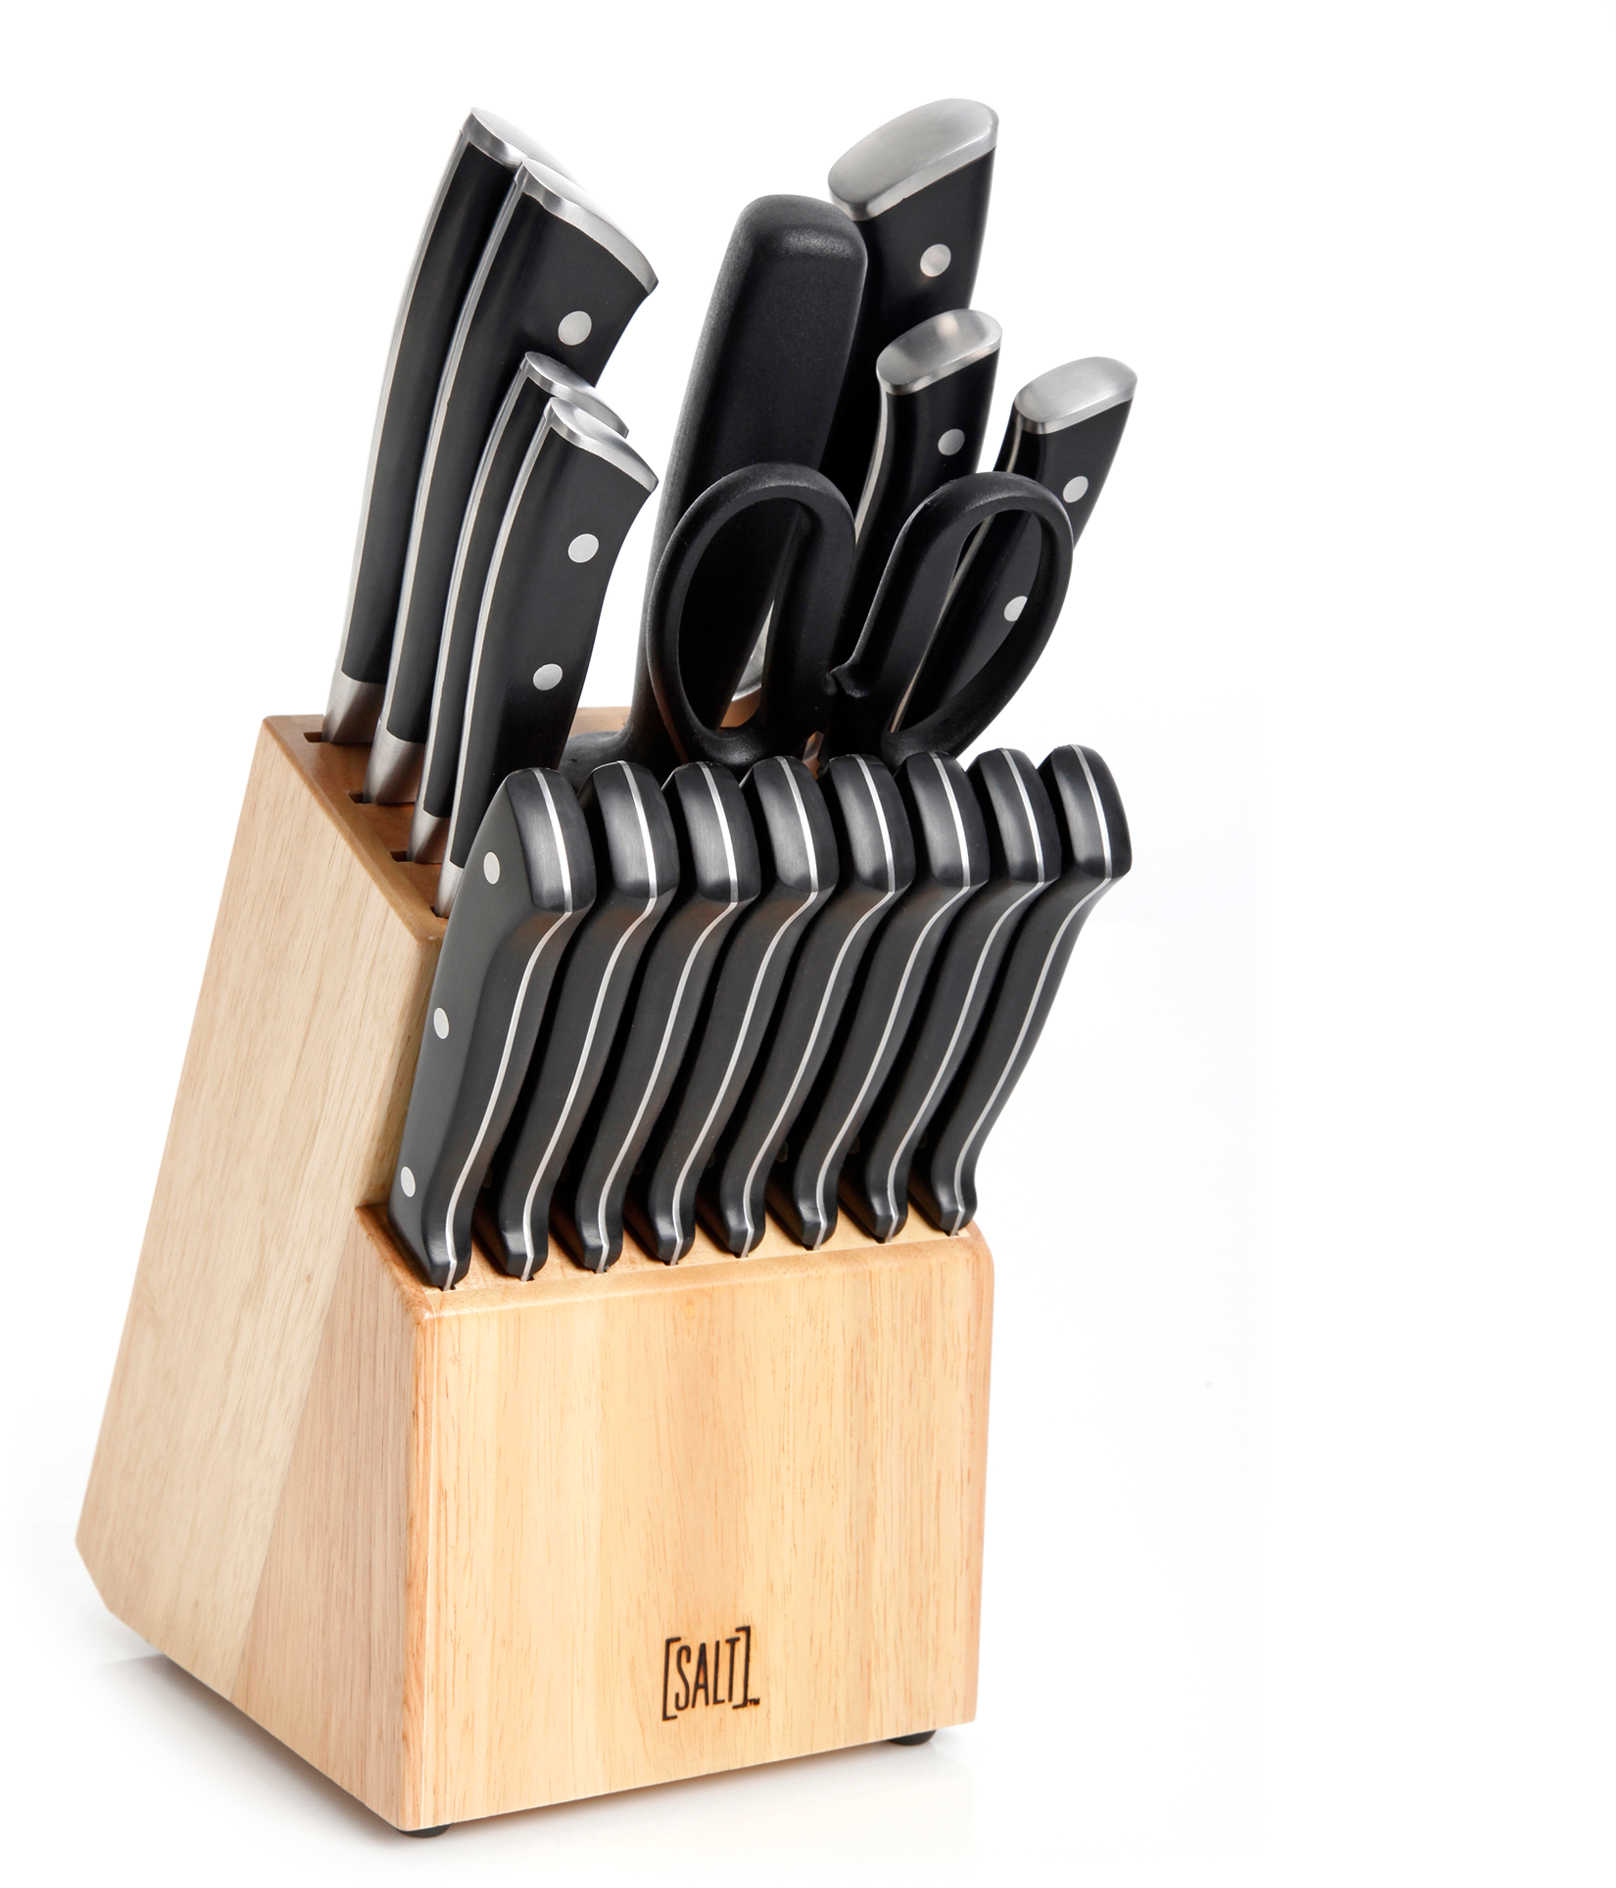 SALT™ Forged Triple Rivet 18-Piece Cutlery Set in Black - Bed Bath & Beyond